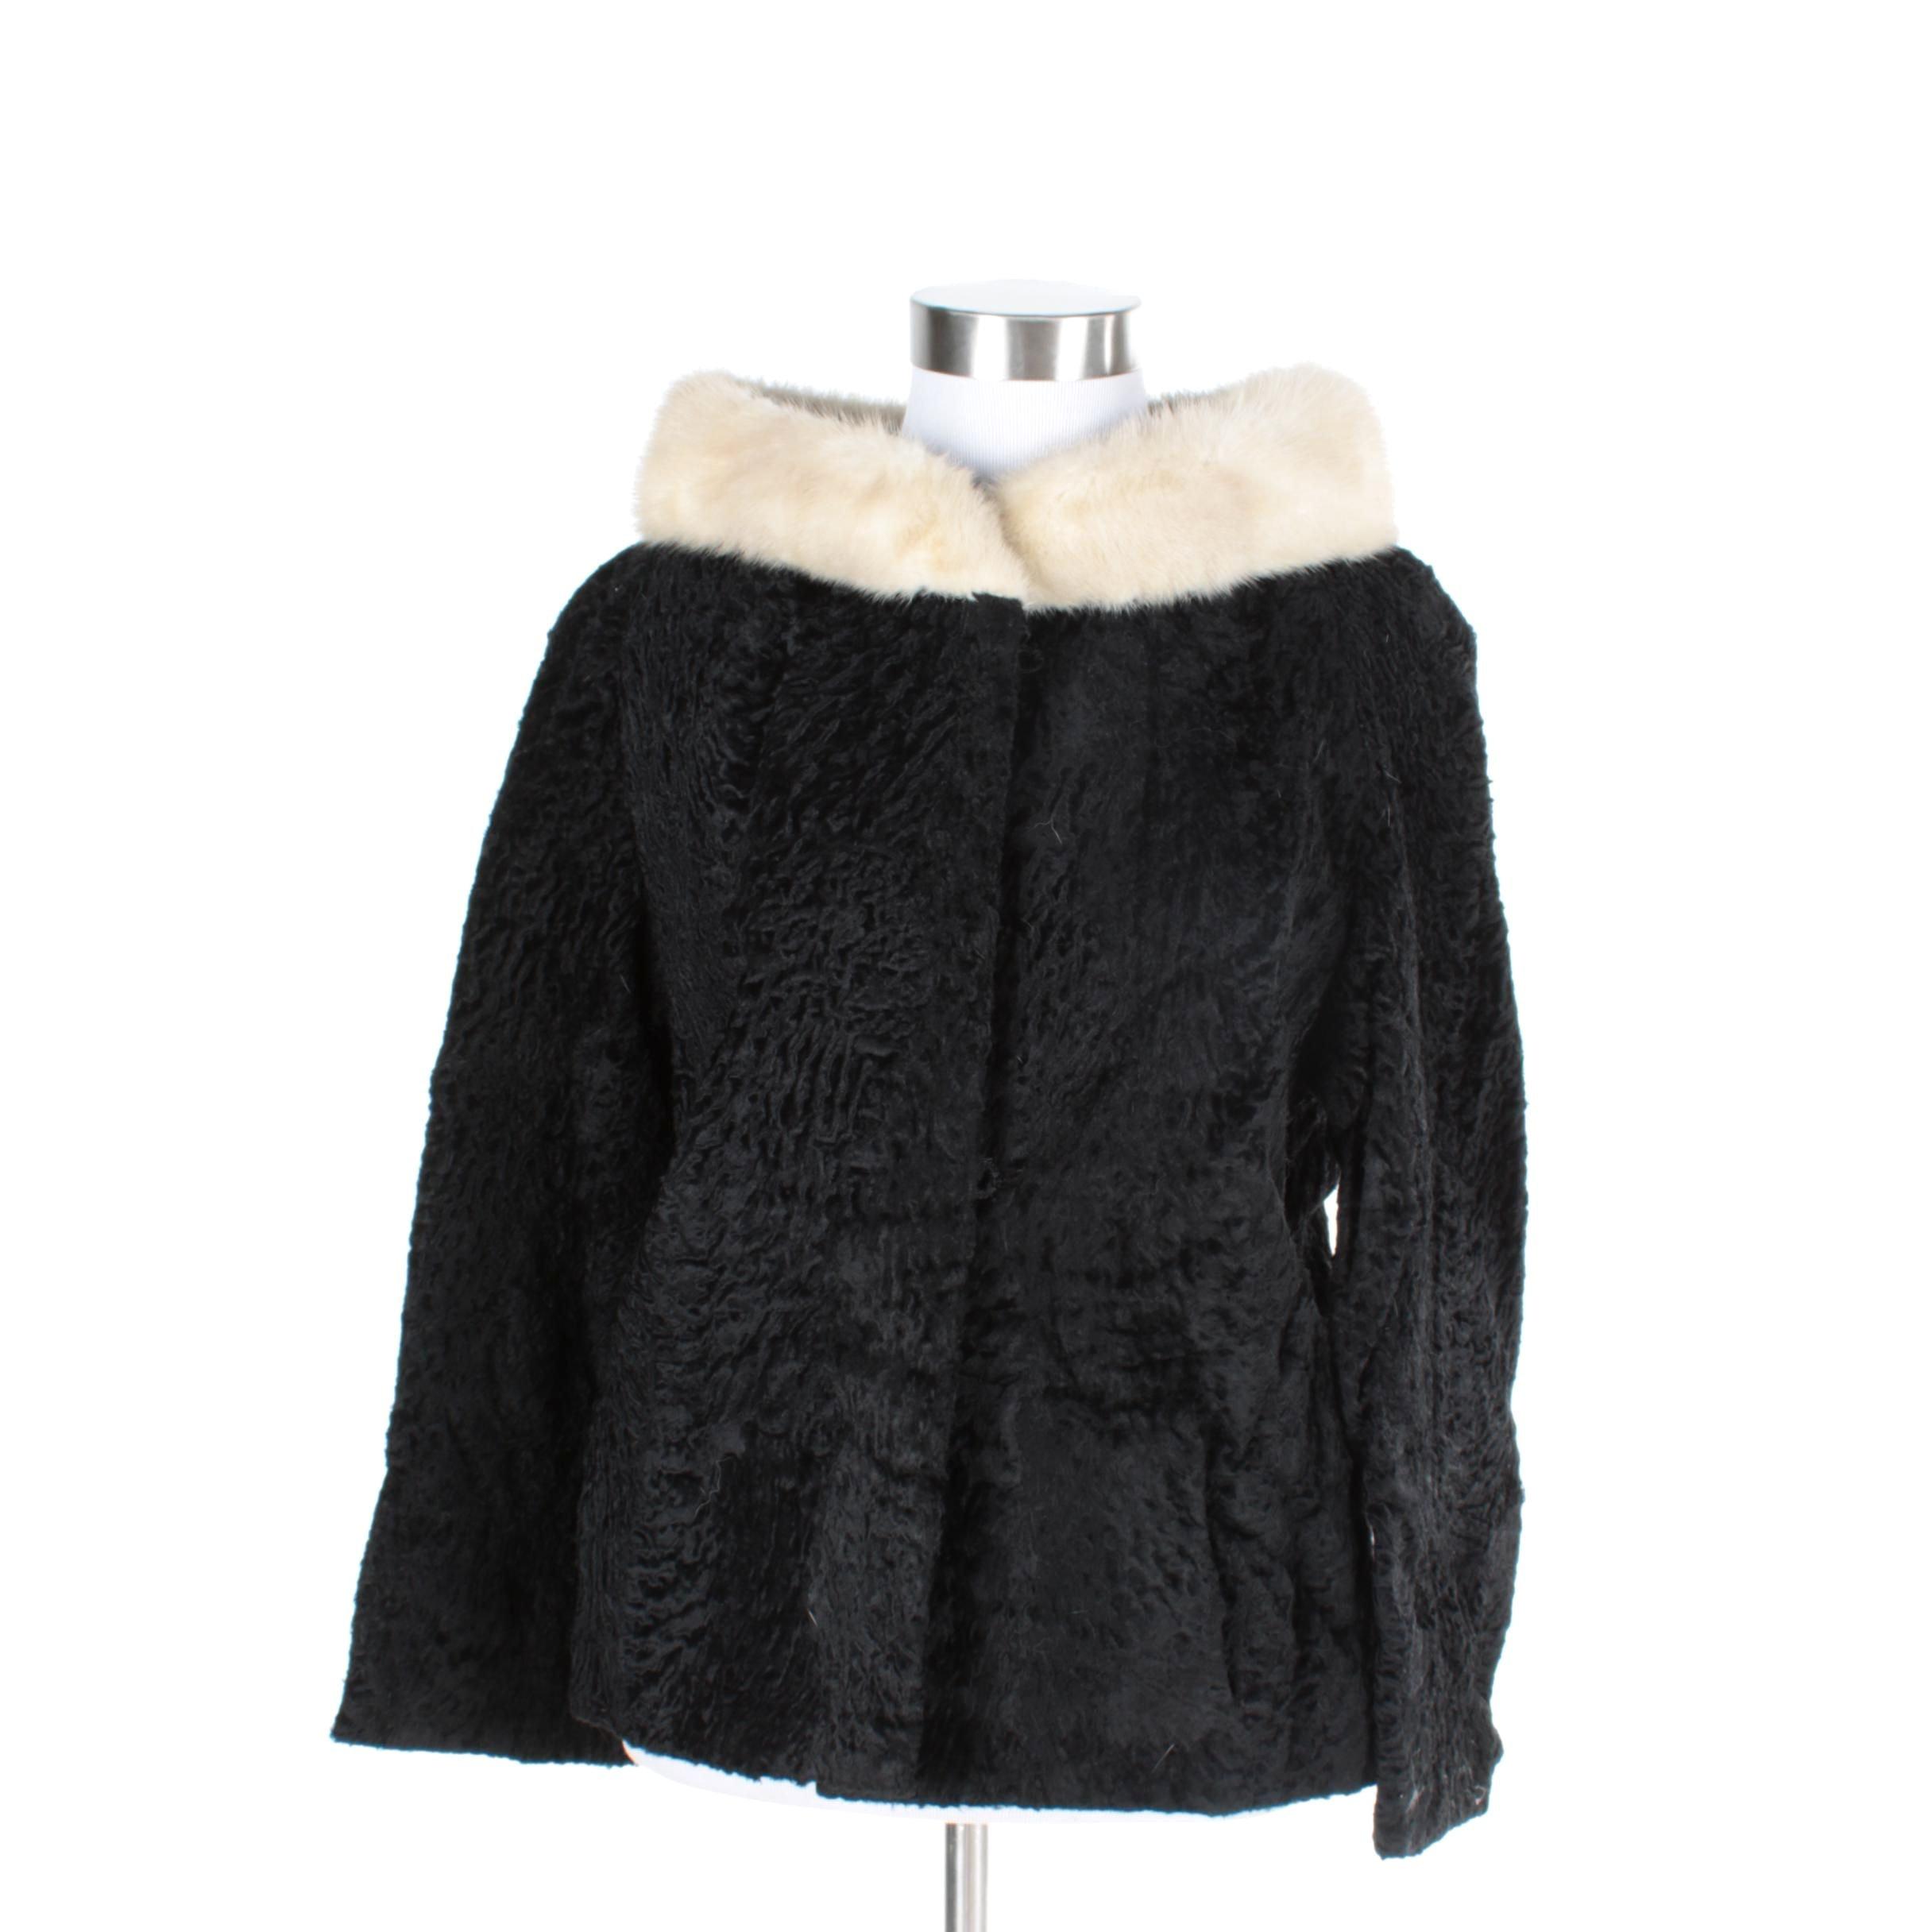 Women's Persian Lamb Fur Coat with Mink Collar